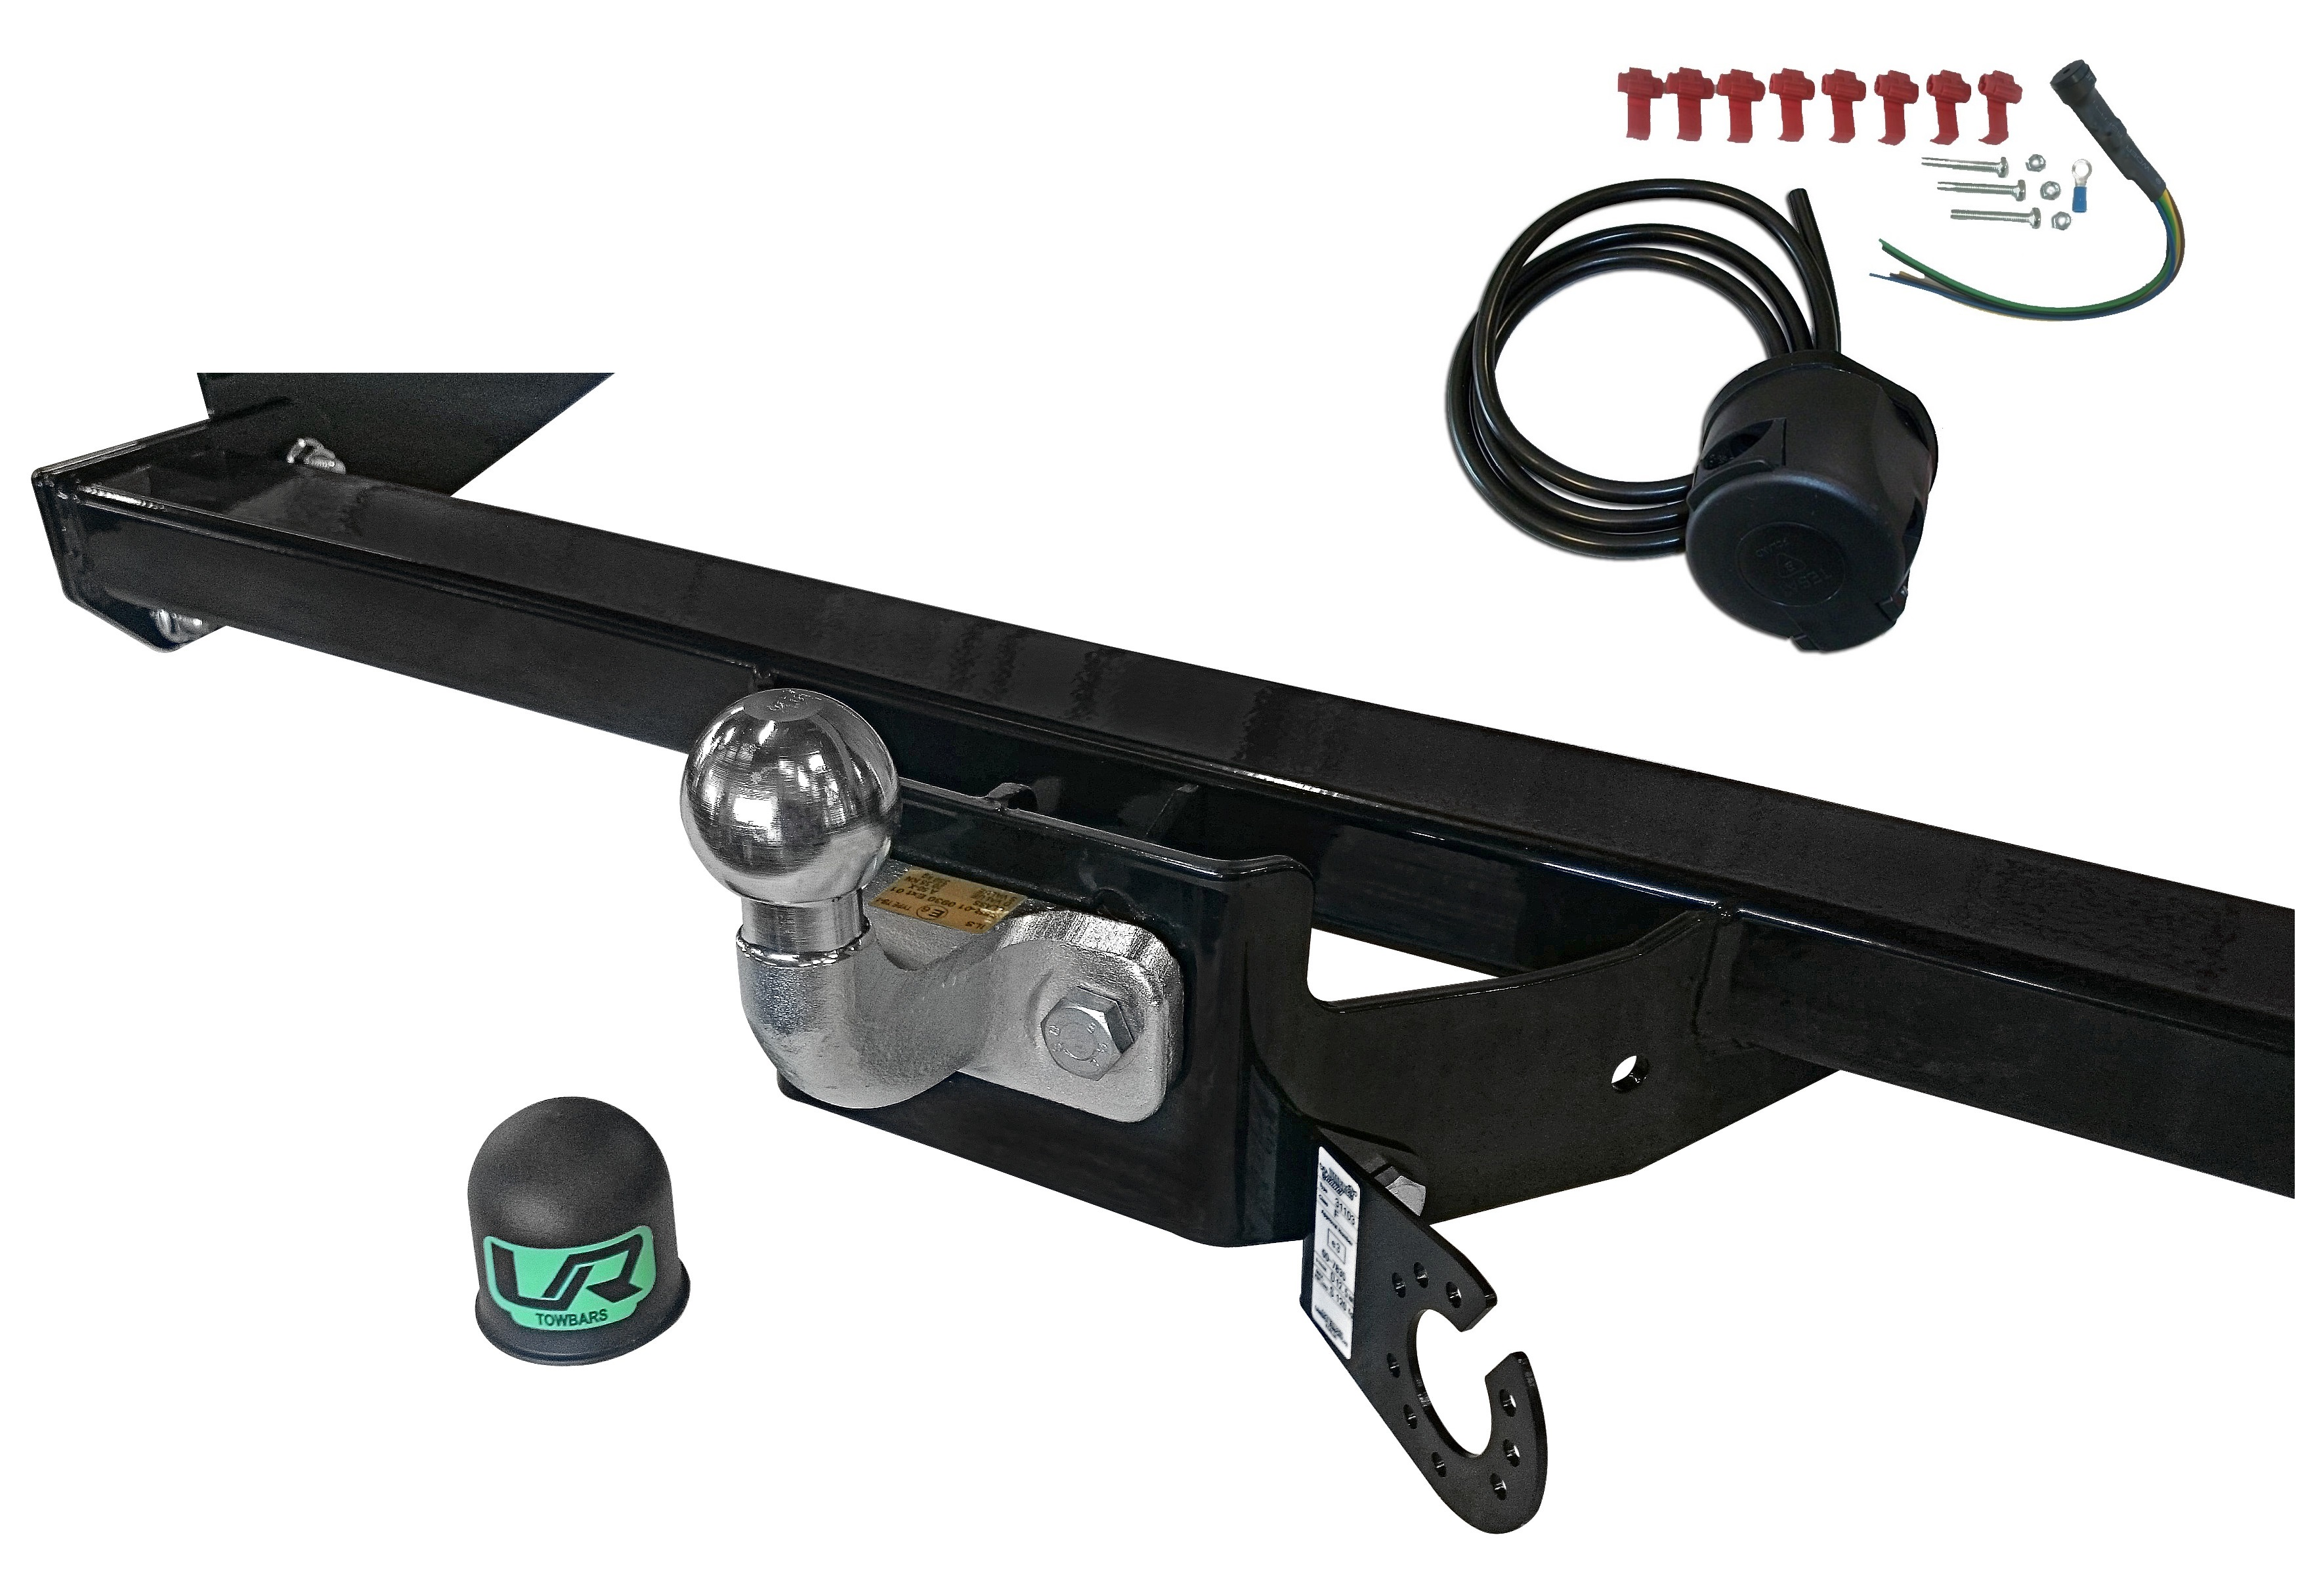 renault master tow bar wiring diagram fixed flange towbar 7 pin kit wiring tow bar for ford ranger mazda b2500 | ebay